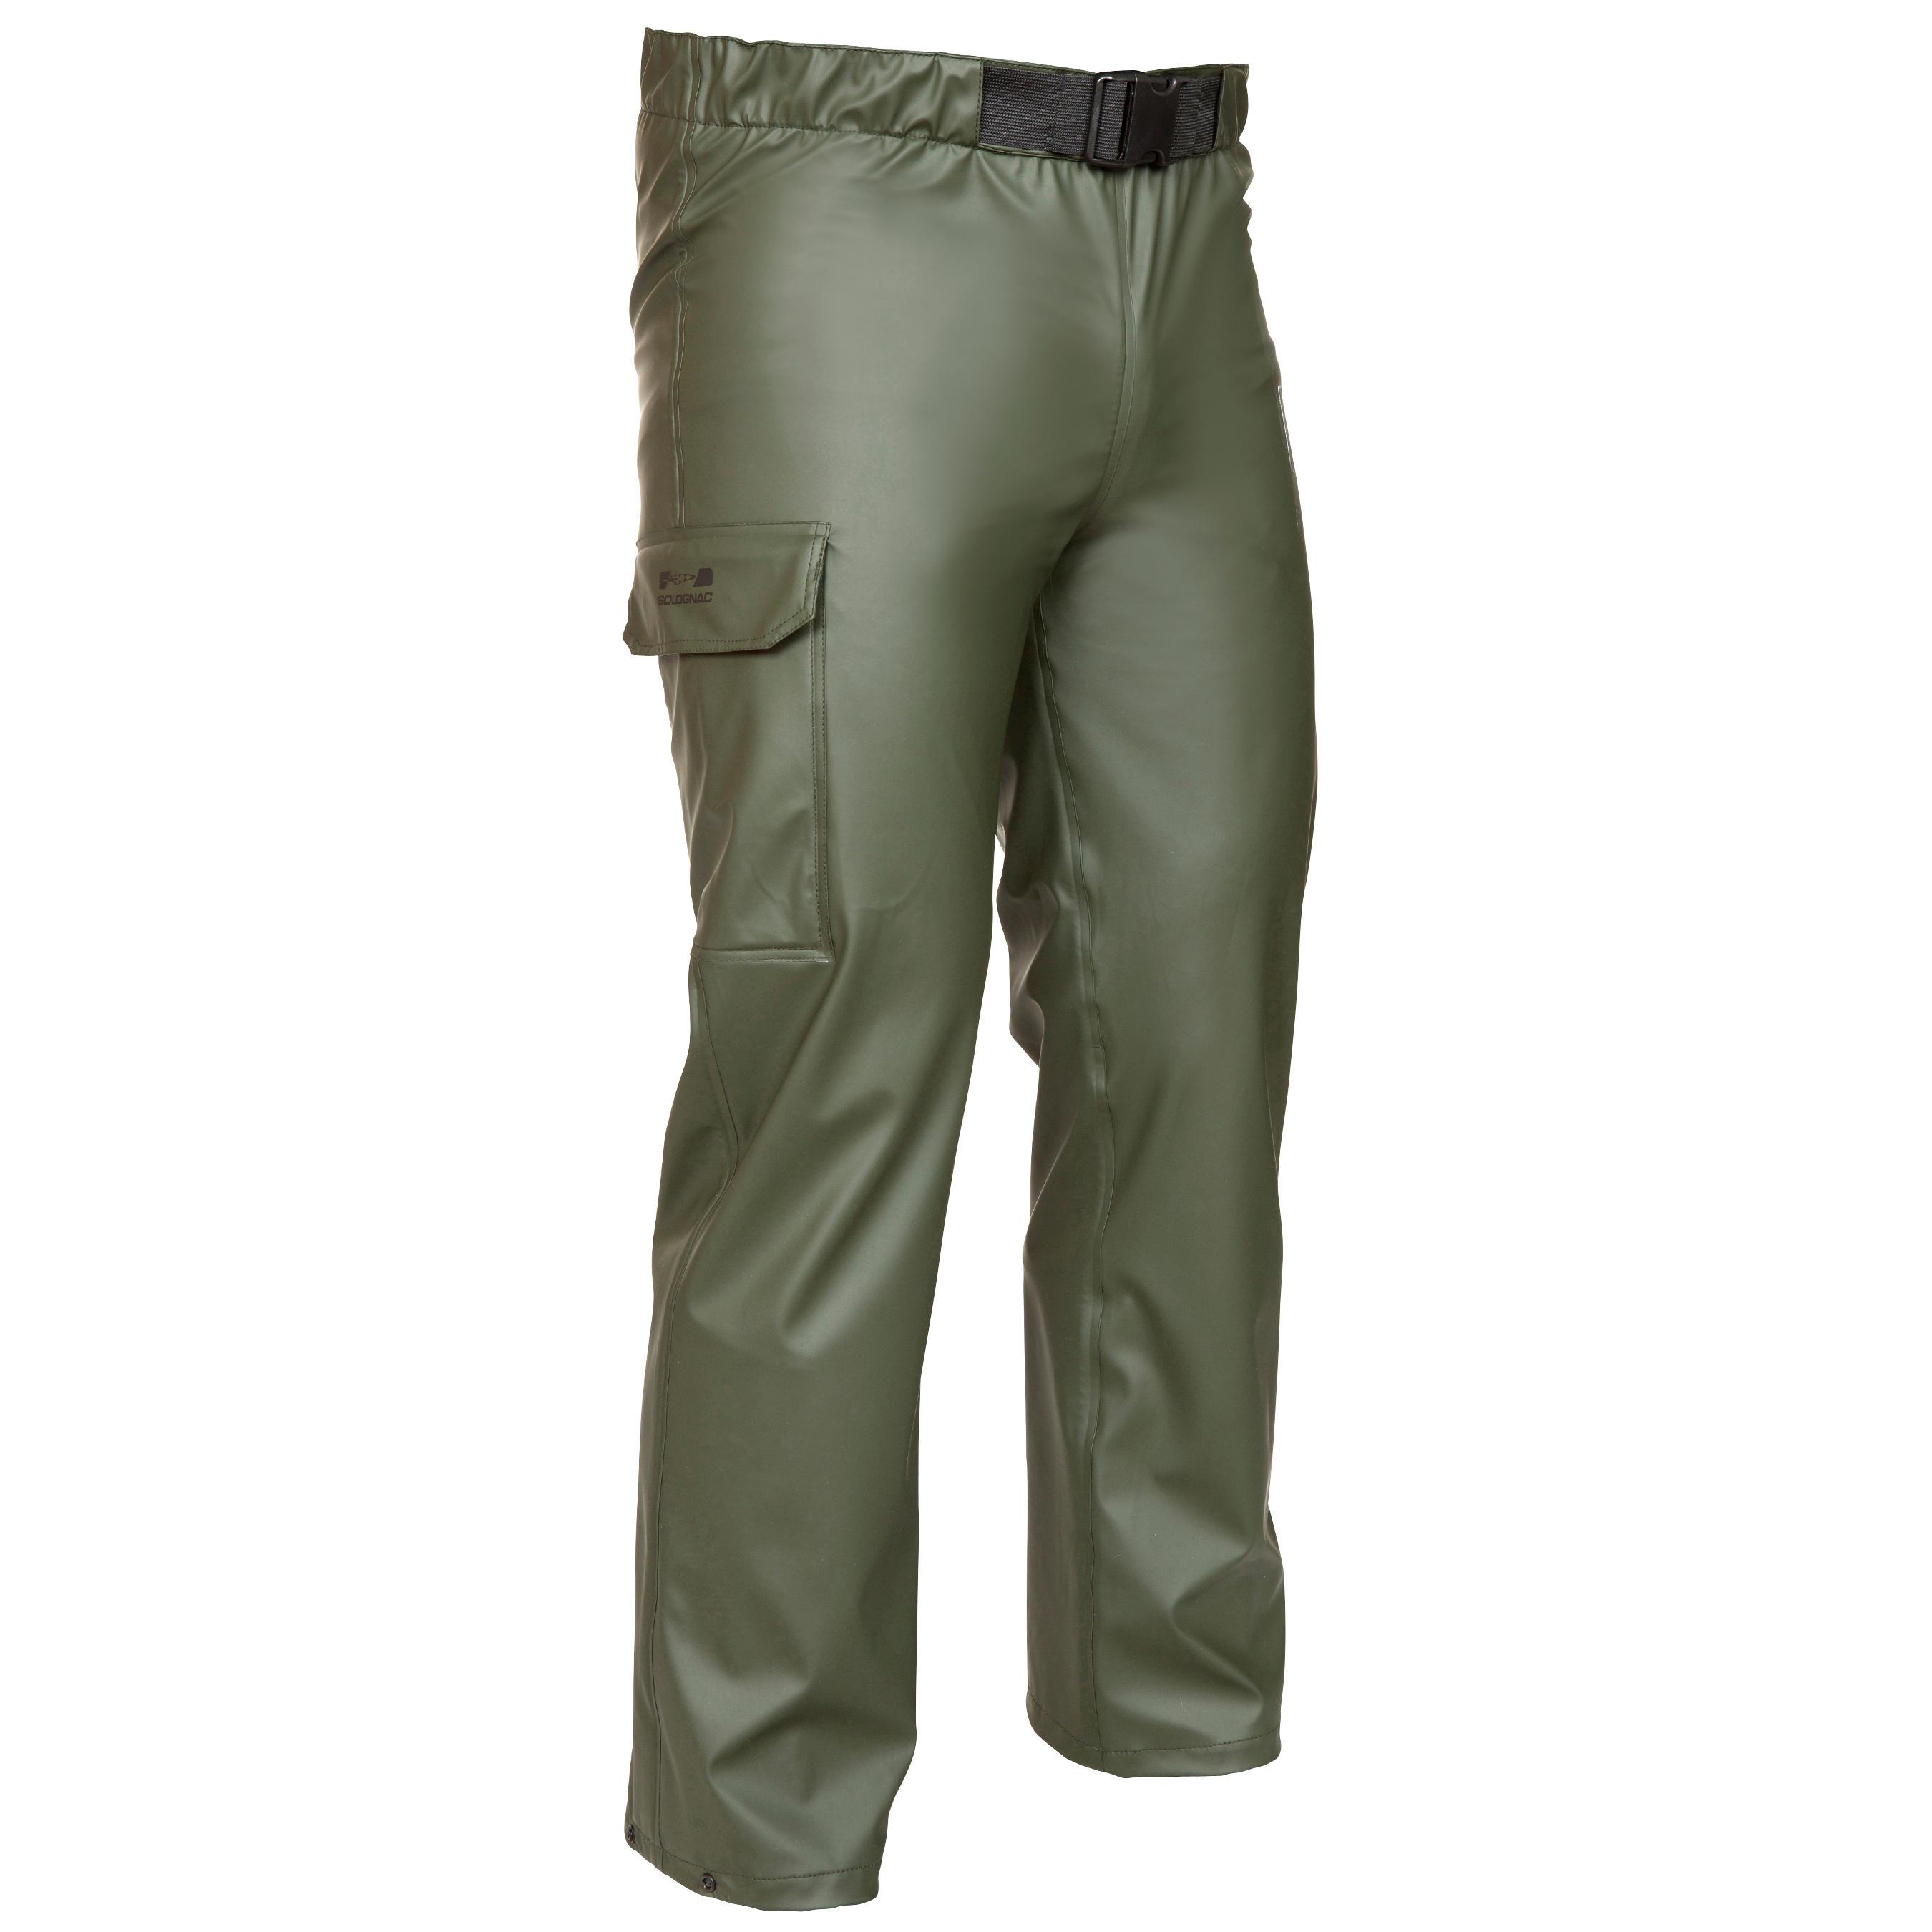 Jagdregenhose Glenarm 300 grün | Sportbekleidung > Sporthosen > Regenhosen | Grün - Khaki | Solognac